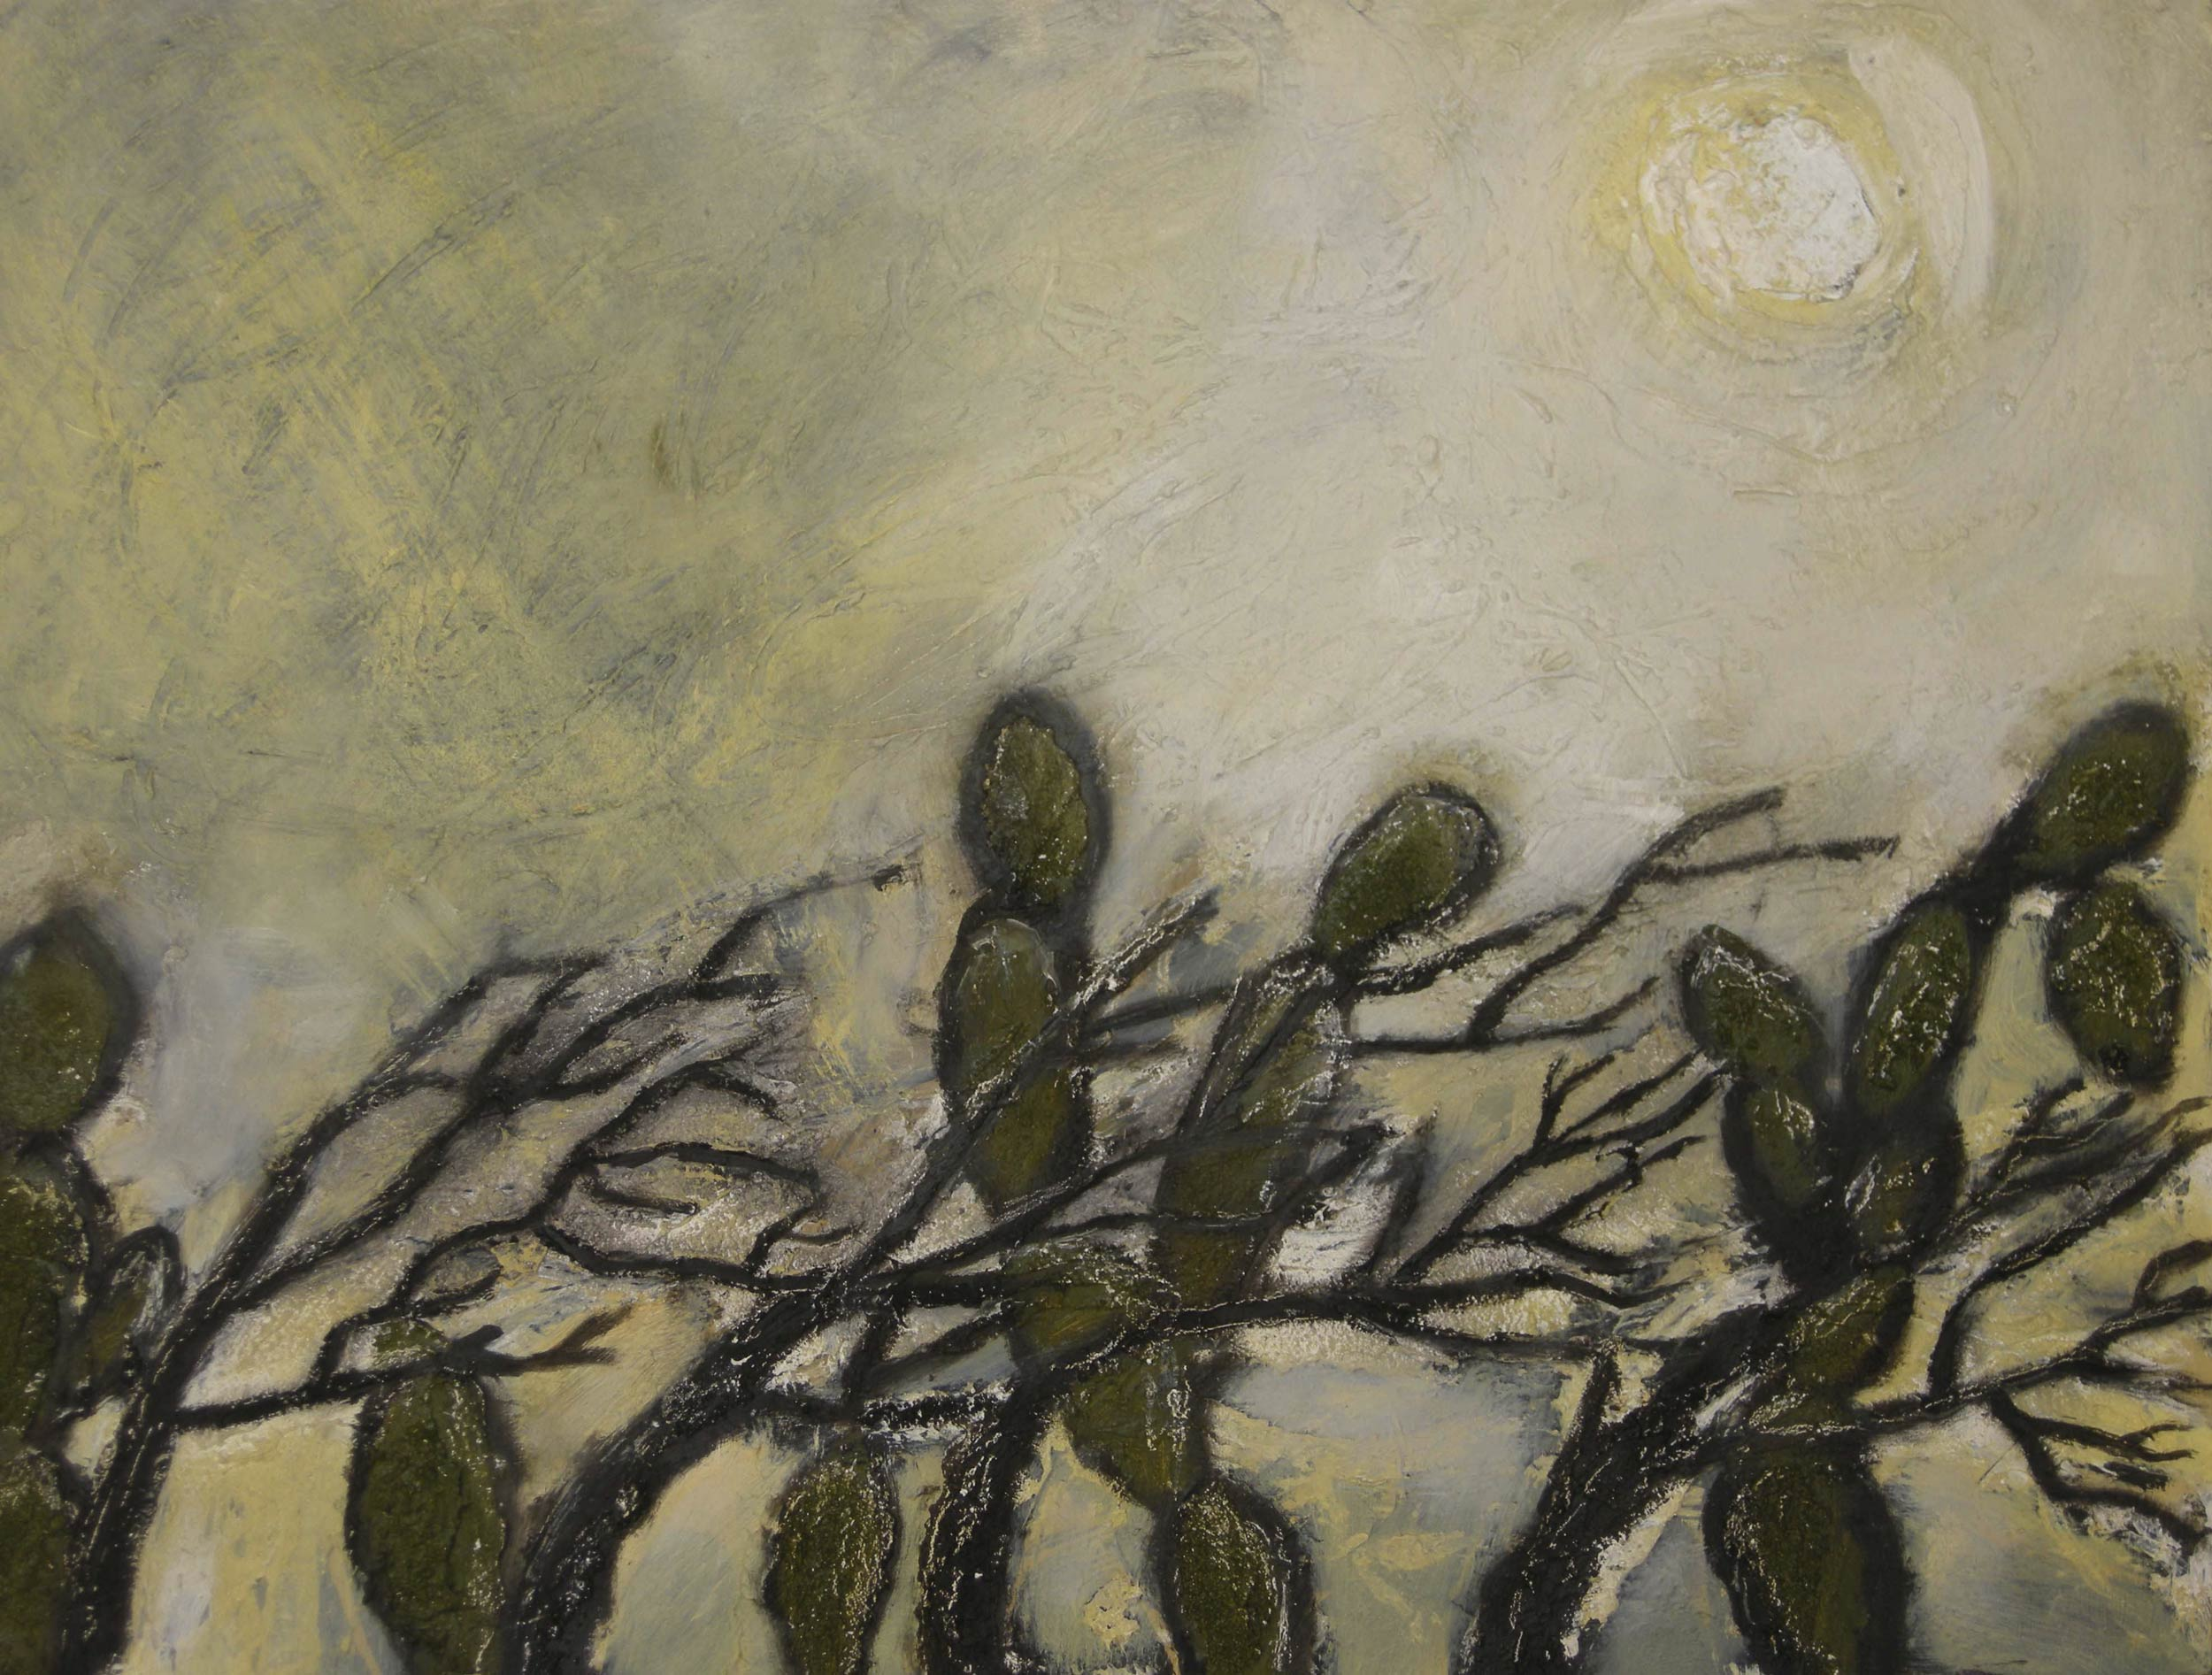 WINDY DAY IN SALINA CRUZ  Oil and Acrylic on Wood | 35.5 x 25.5 cm | 2009